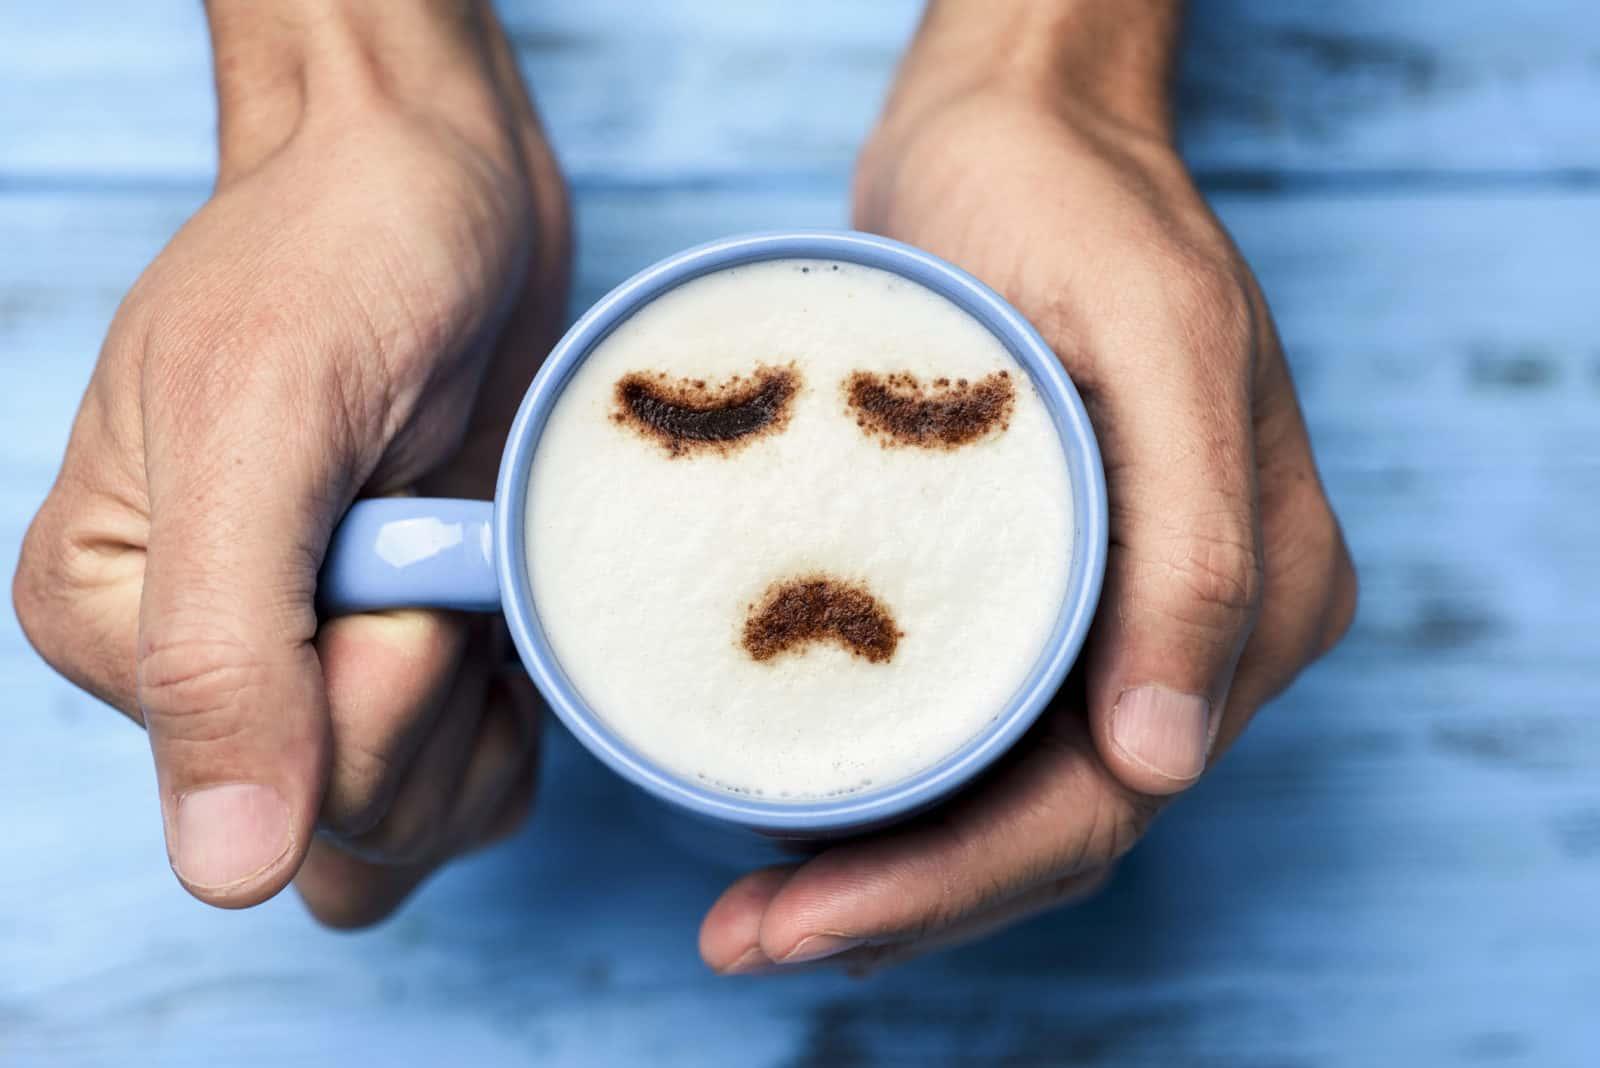 What Does Depression Feel Like? | BodylogicMD